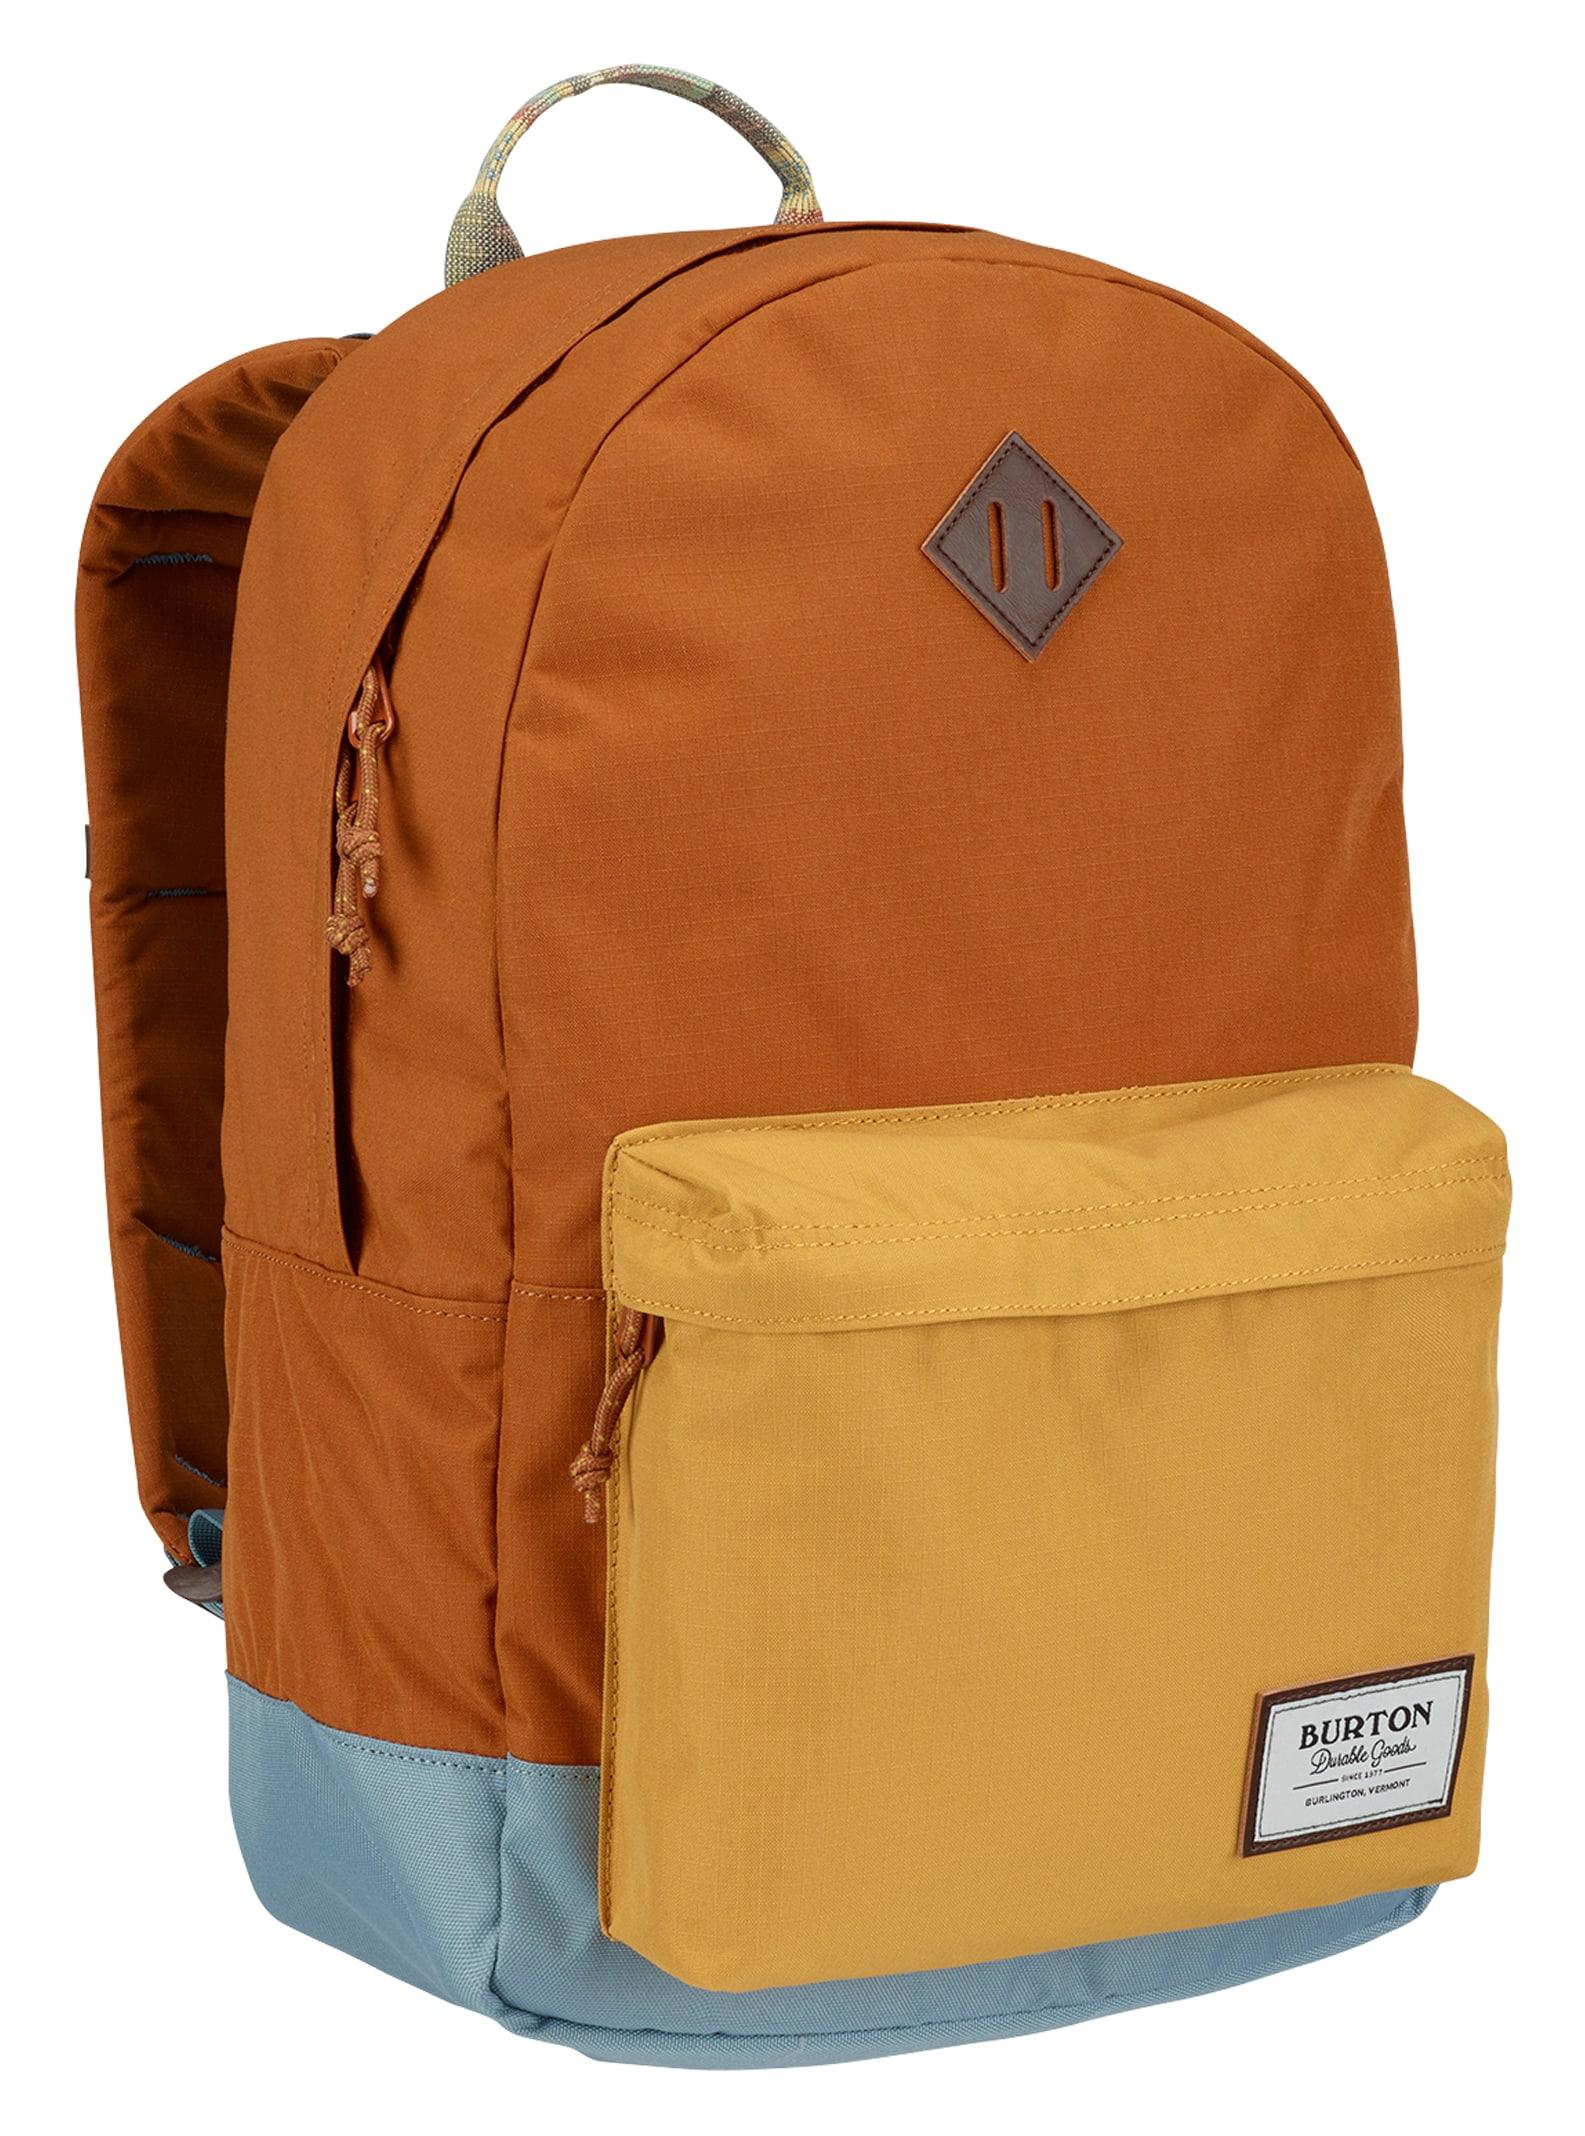 1bf31e5d511ce6 Burton Kettle Backpack | Burton.com Spring/Summer 2018